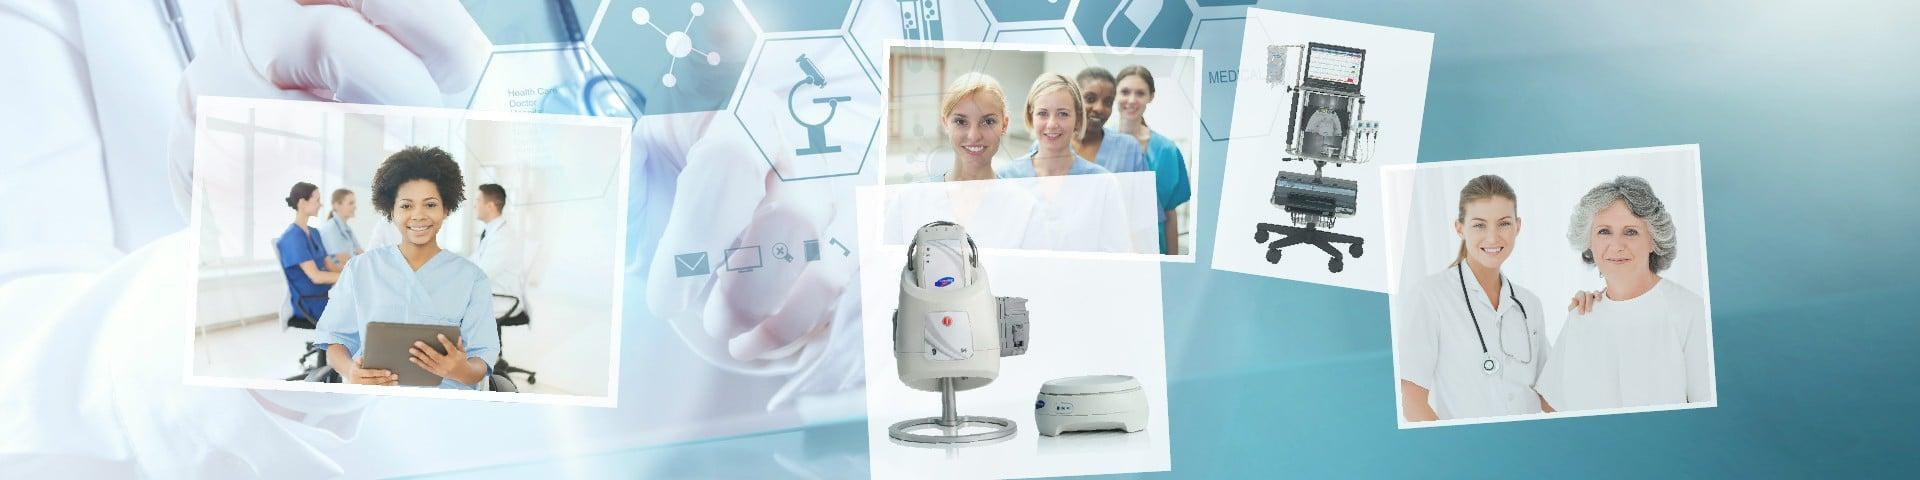 Collage_nurses_urodynamics_equipment.jpg